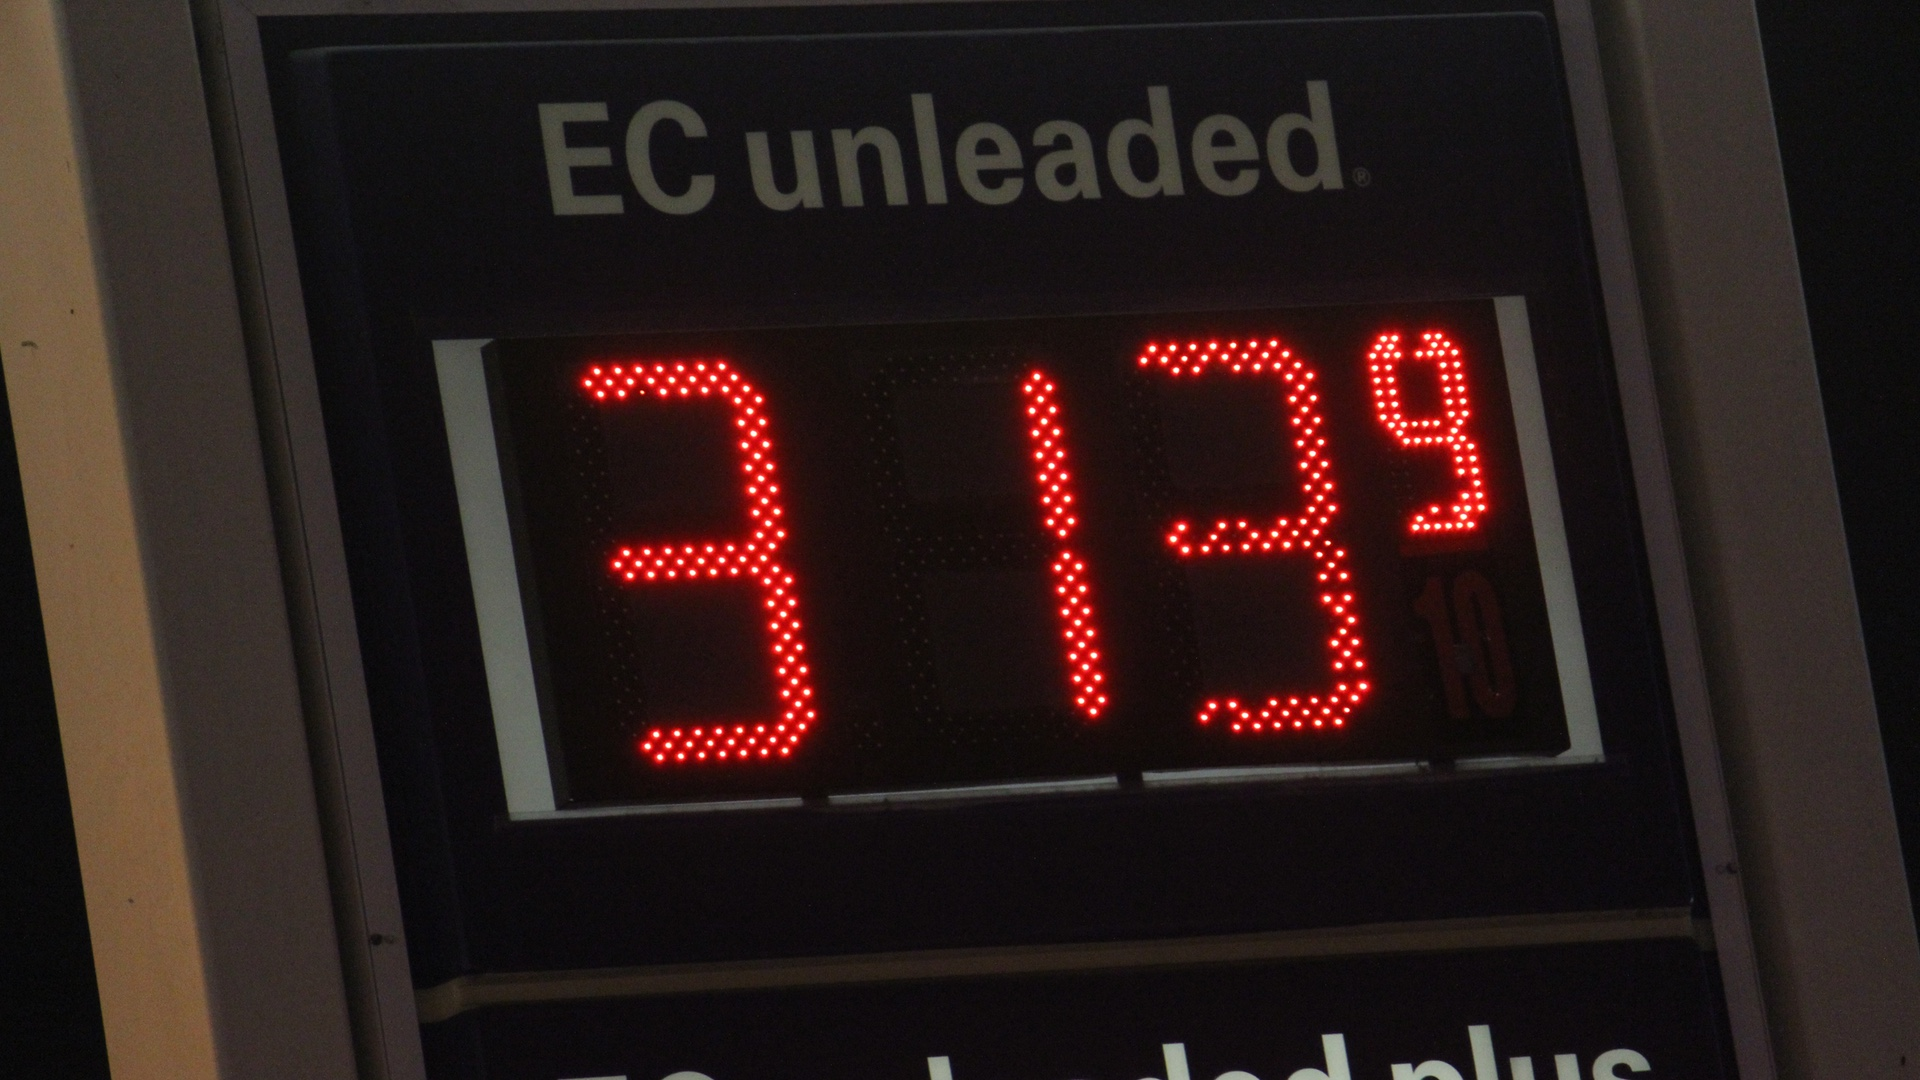 Gas Price 20141026 Arco 3139